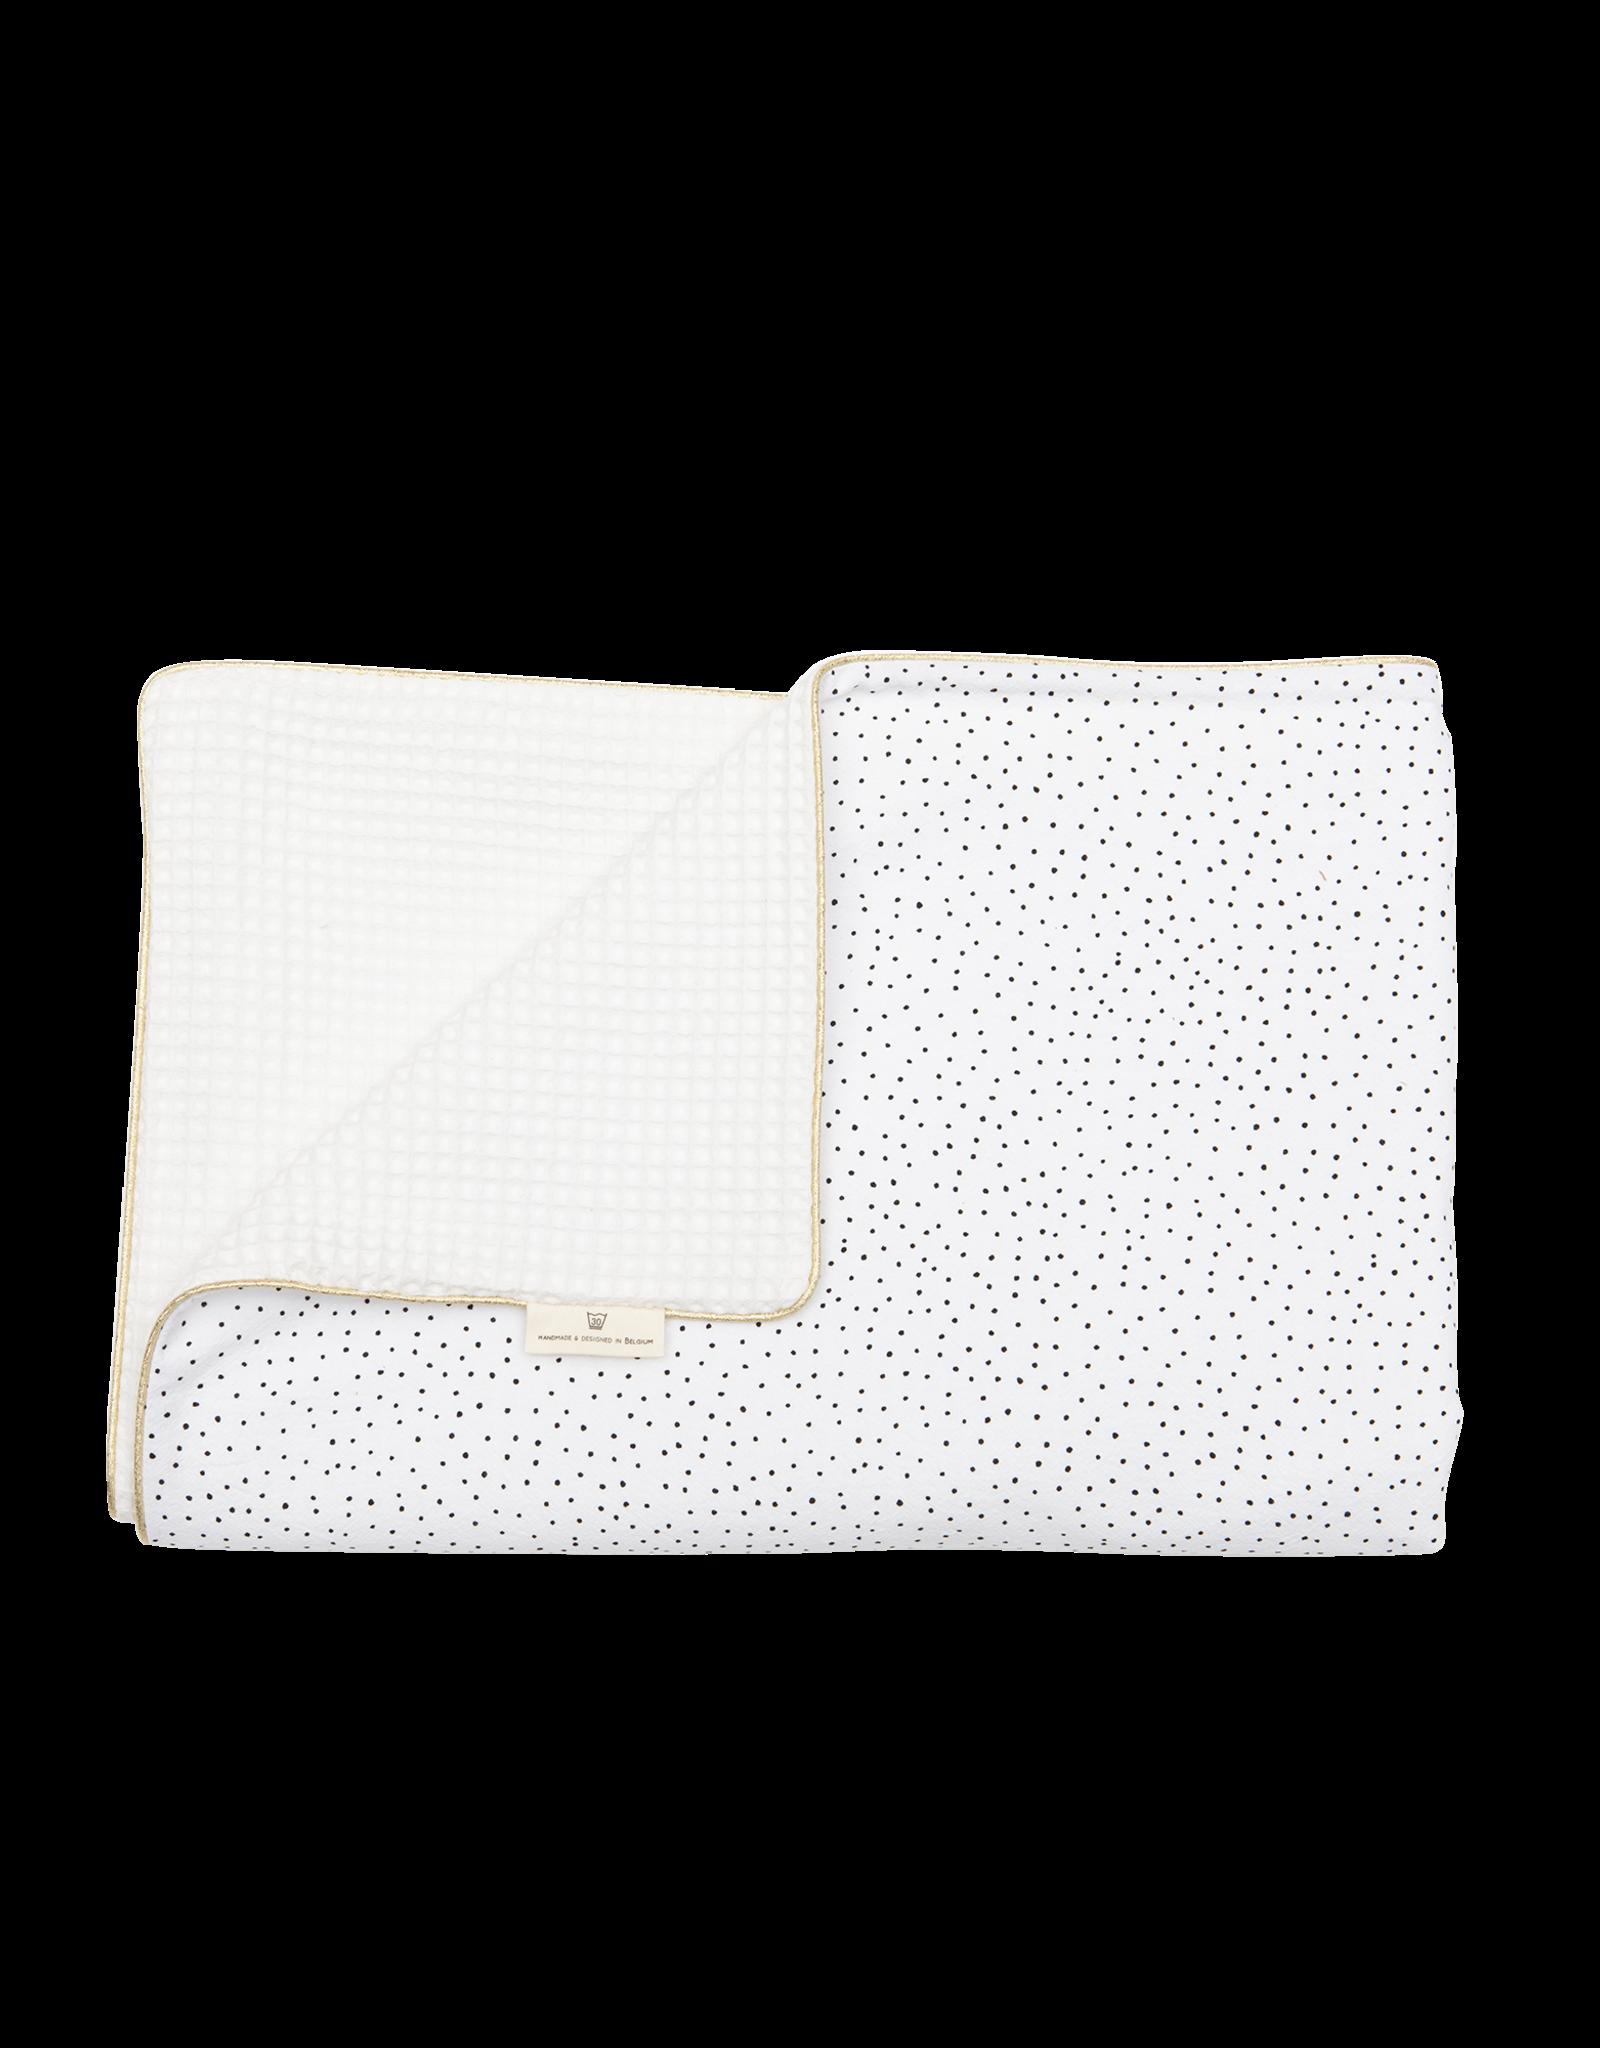 LIL'PAPOE Baby blanket  75 x 100 cm black dots